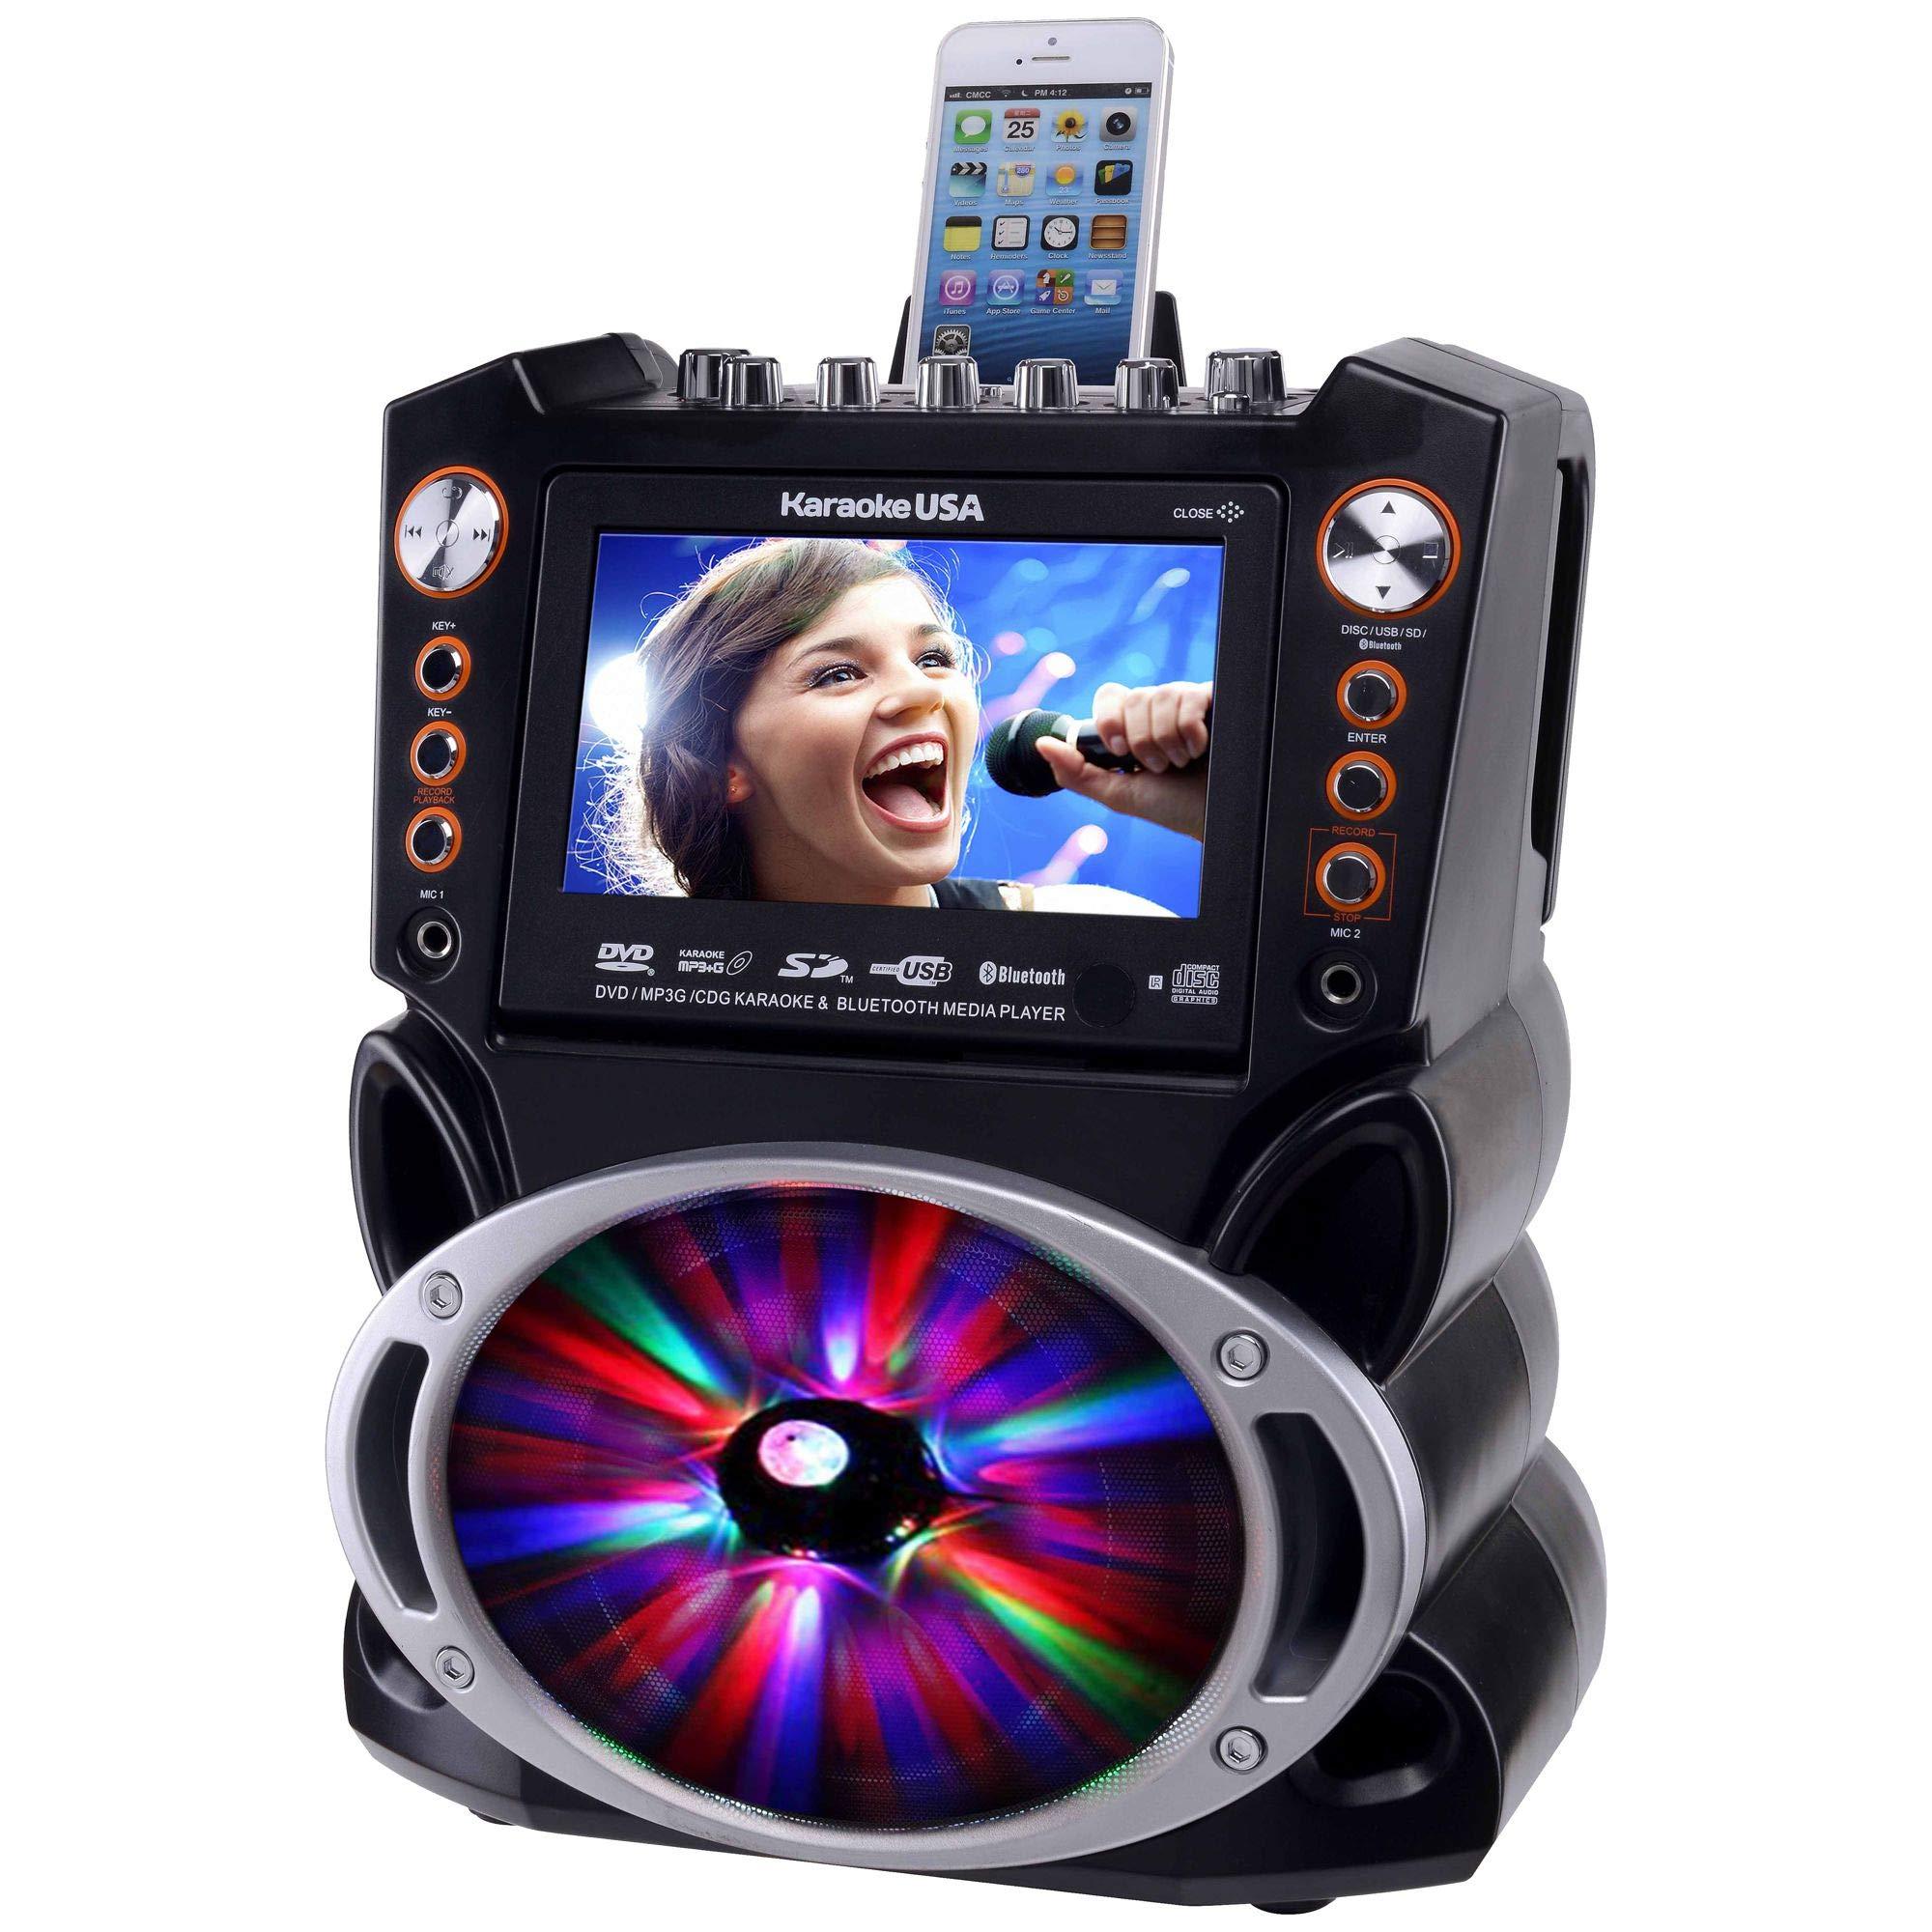 Karaoke USA GF846 DVD/CDG/MP3G Karaoke Machine with 7'' TFT Color Screen, Record, Bluetooth and LED Sync Lights by Karaoke USA (Image #5)